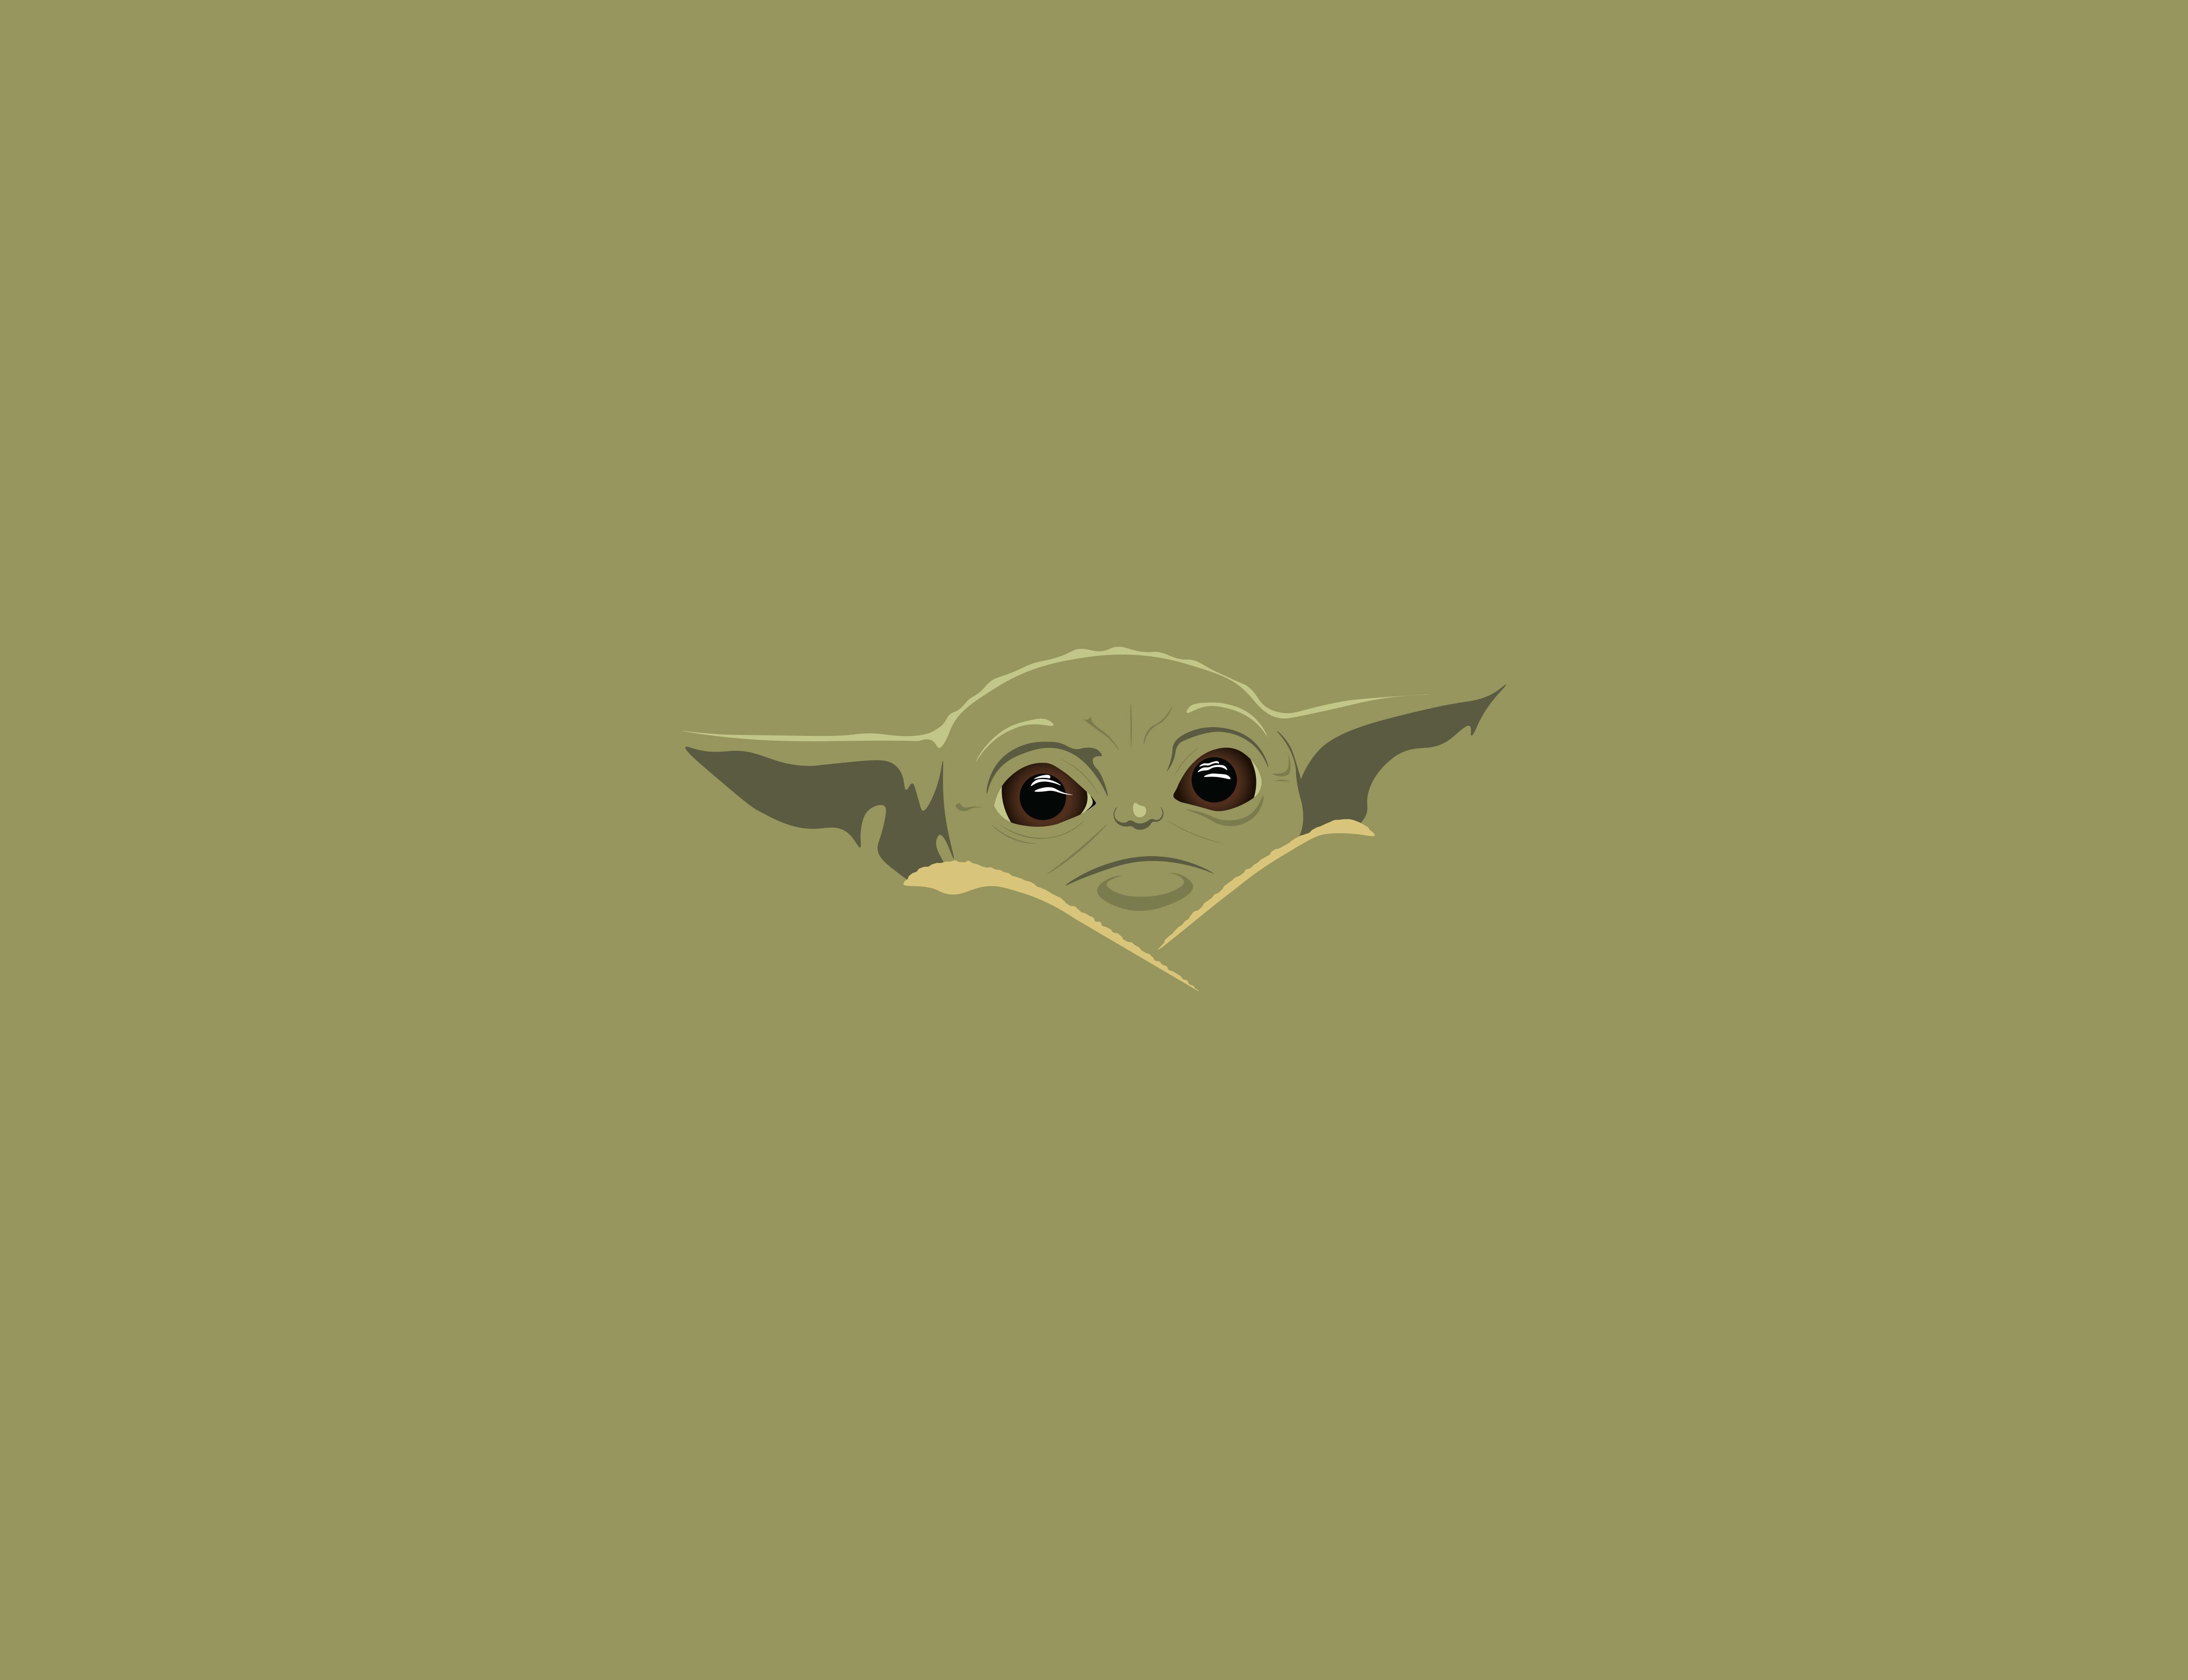 Baby Yoda Minimal Wallpapers Wallpaper Cave